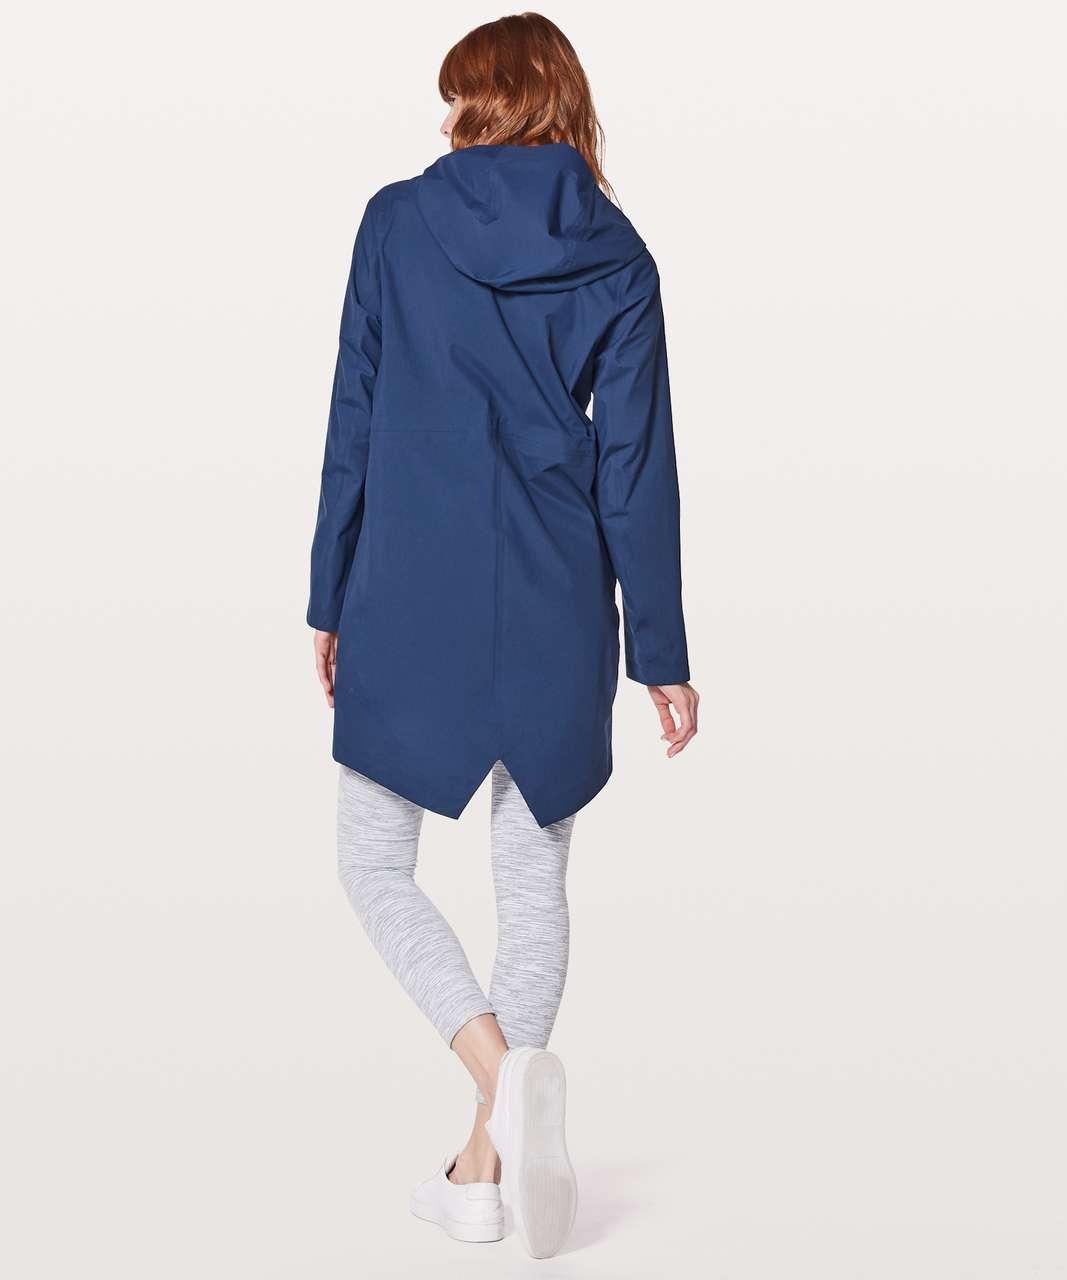 41ce11f83 Lululemon Rain Haven Jacket - Dark Iris - lulu fanatics